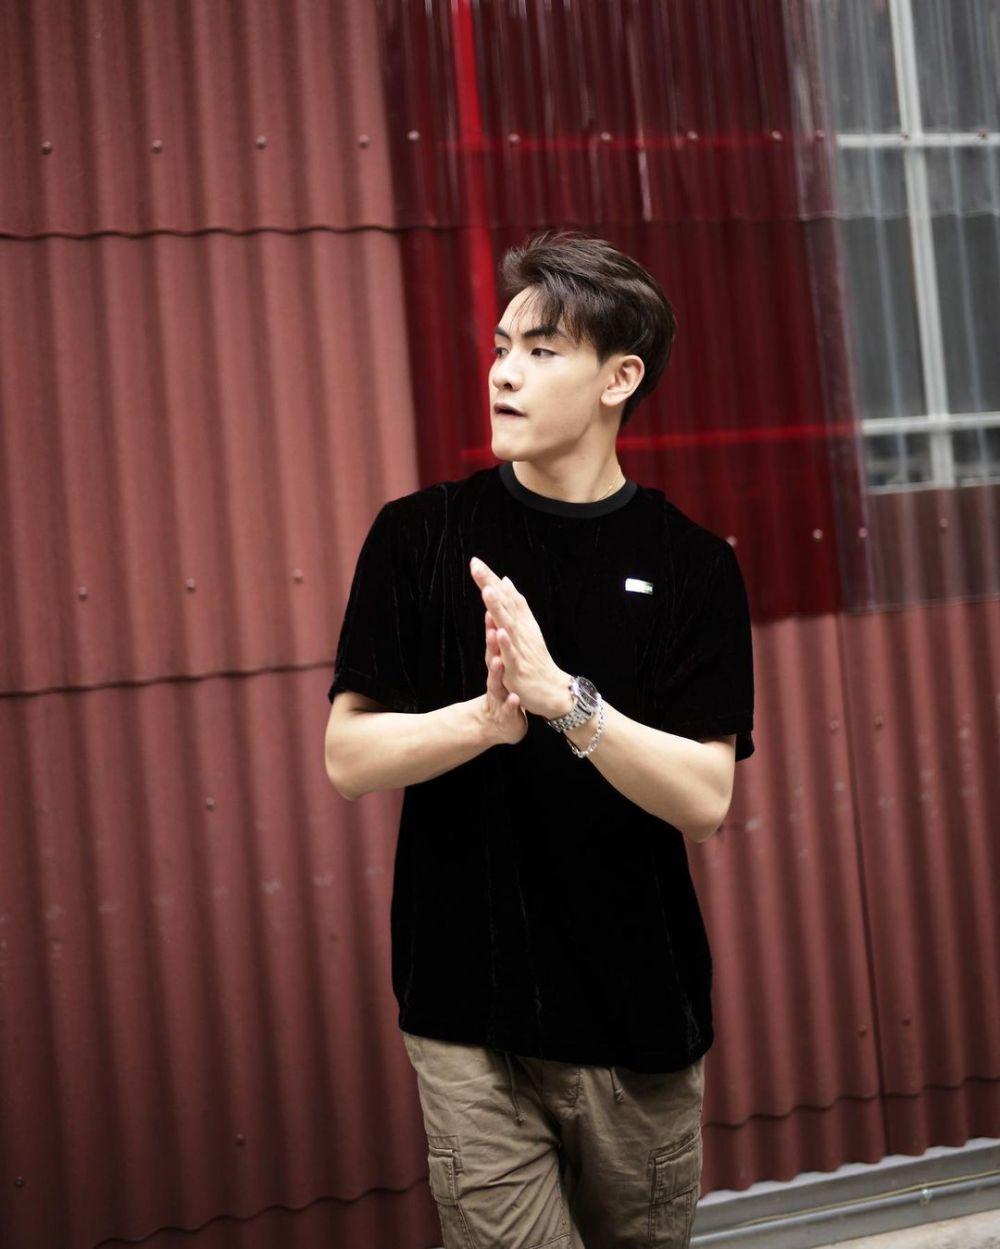 9 Ide Outfit Nuansa Hitam ala Joong Archen, Tetap Modis dan Stylish